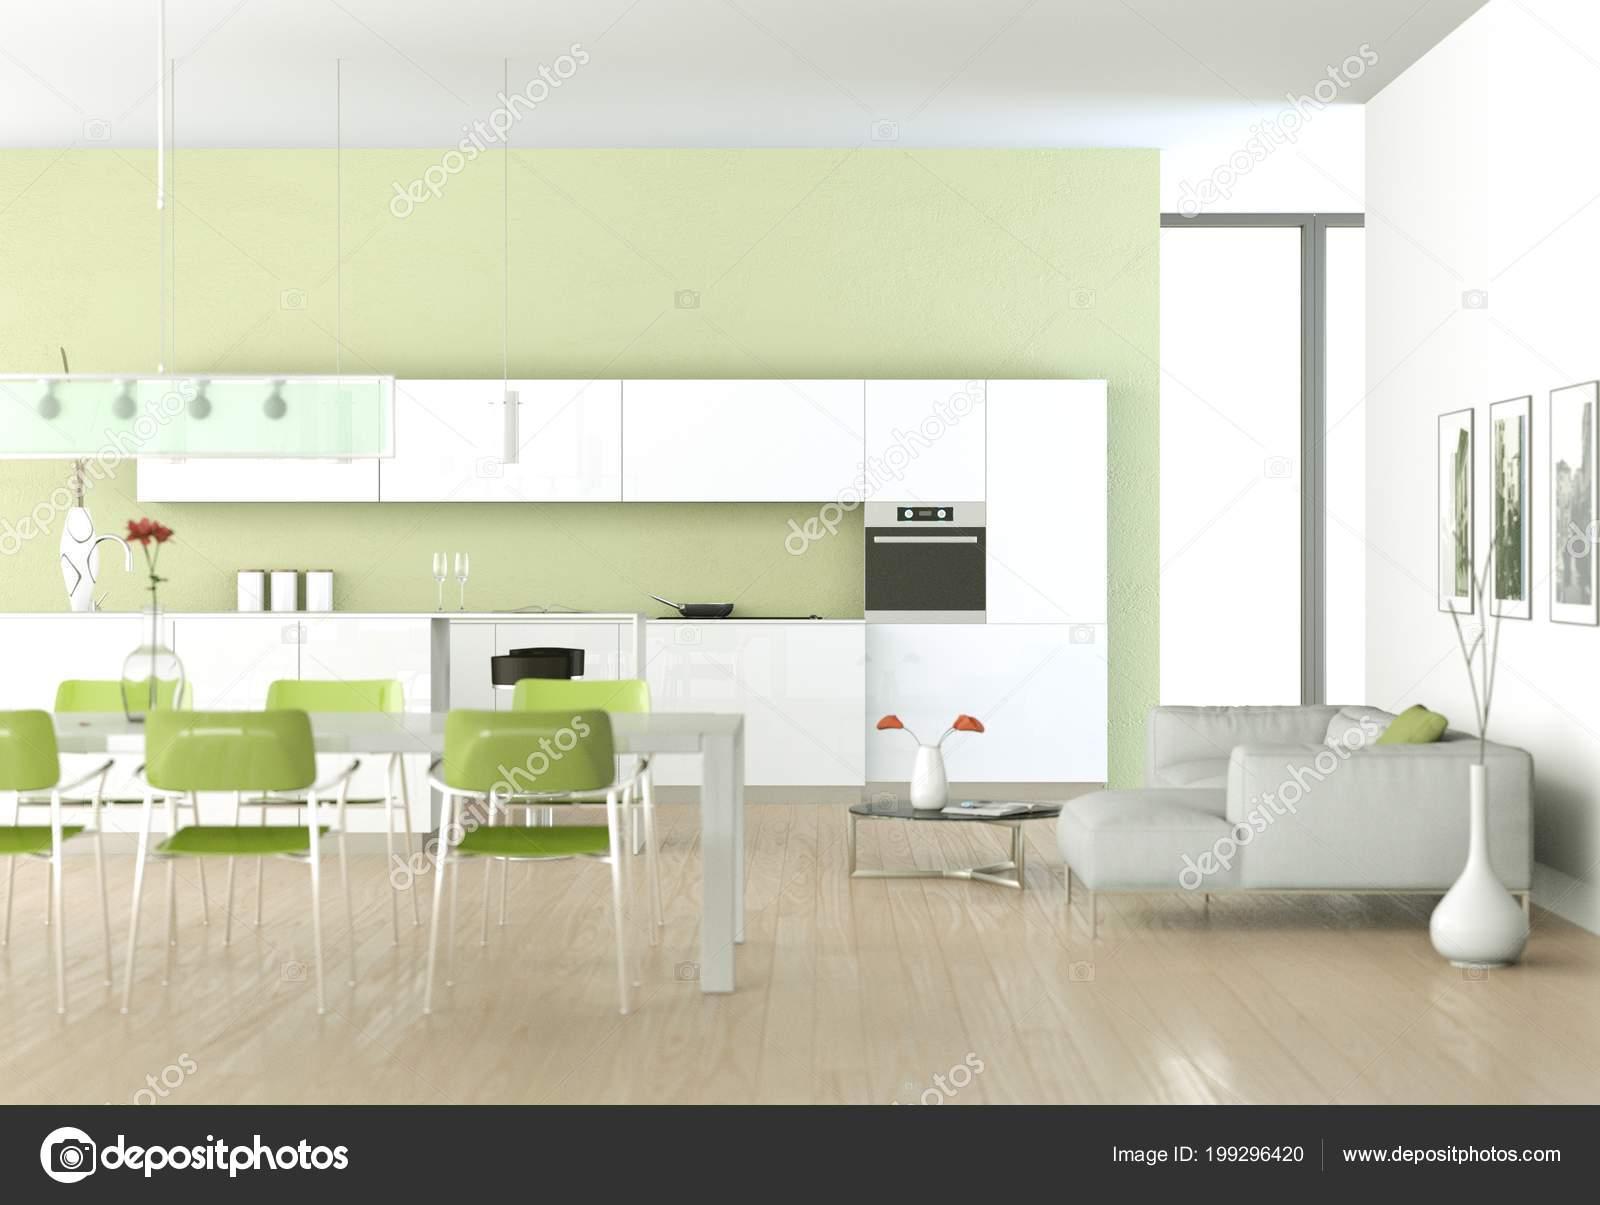 Cucina moderna verde in una stanza con muro in pietra — Foto Stock ...